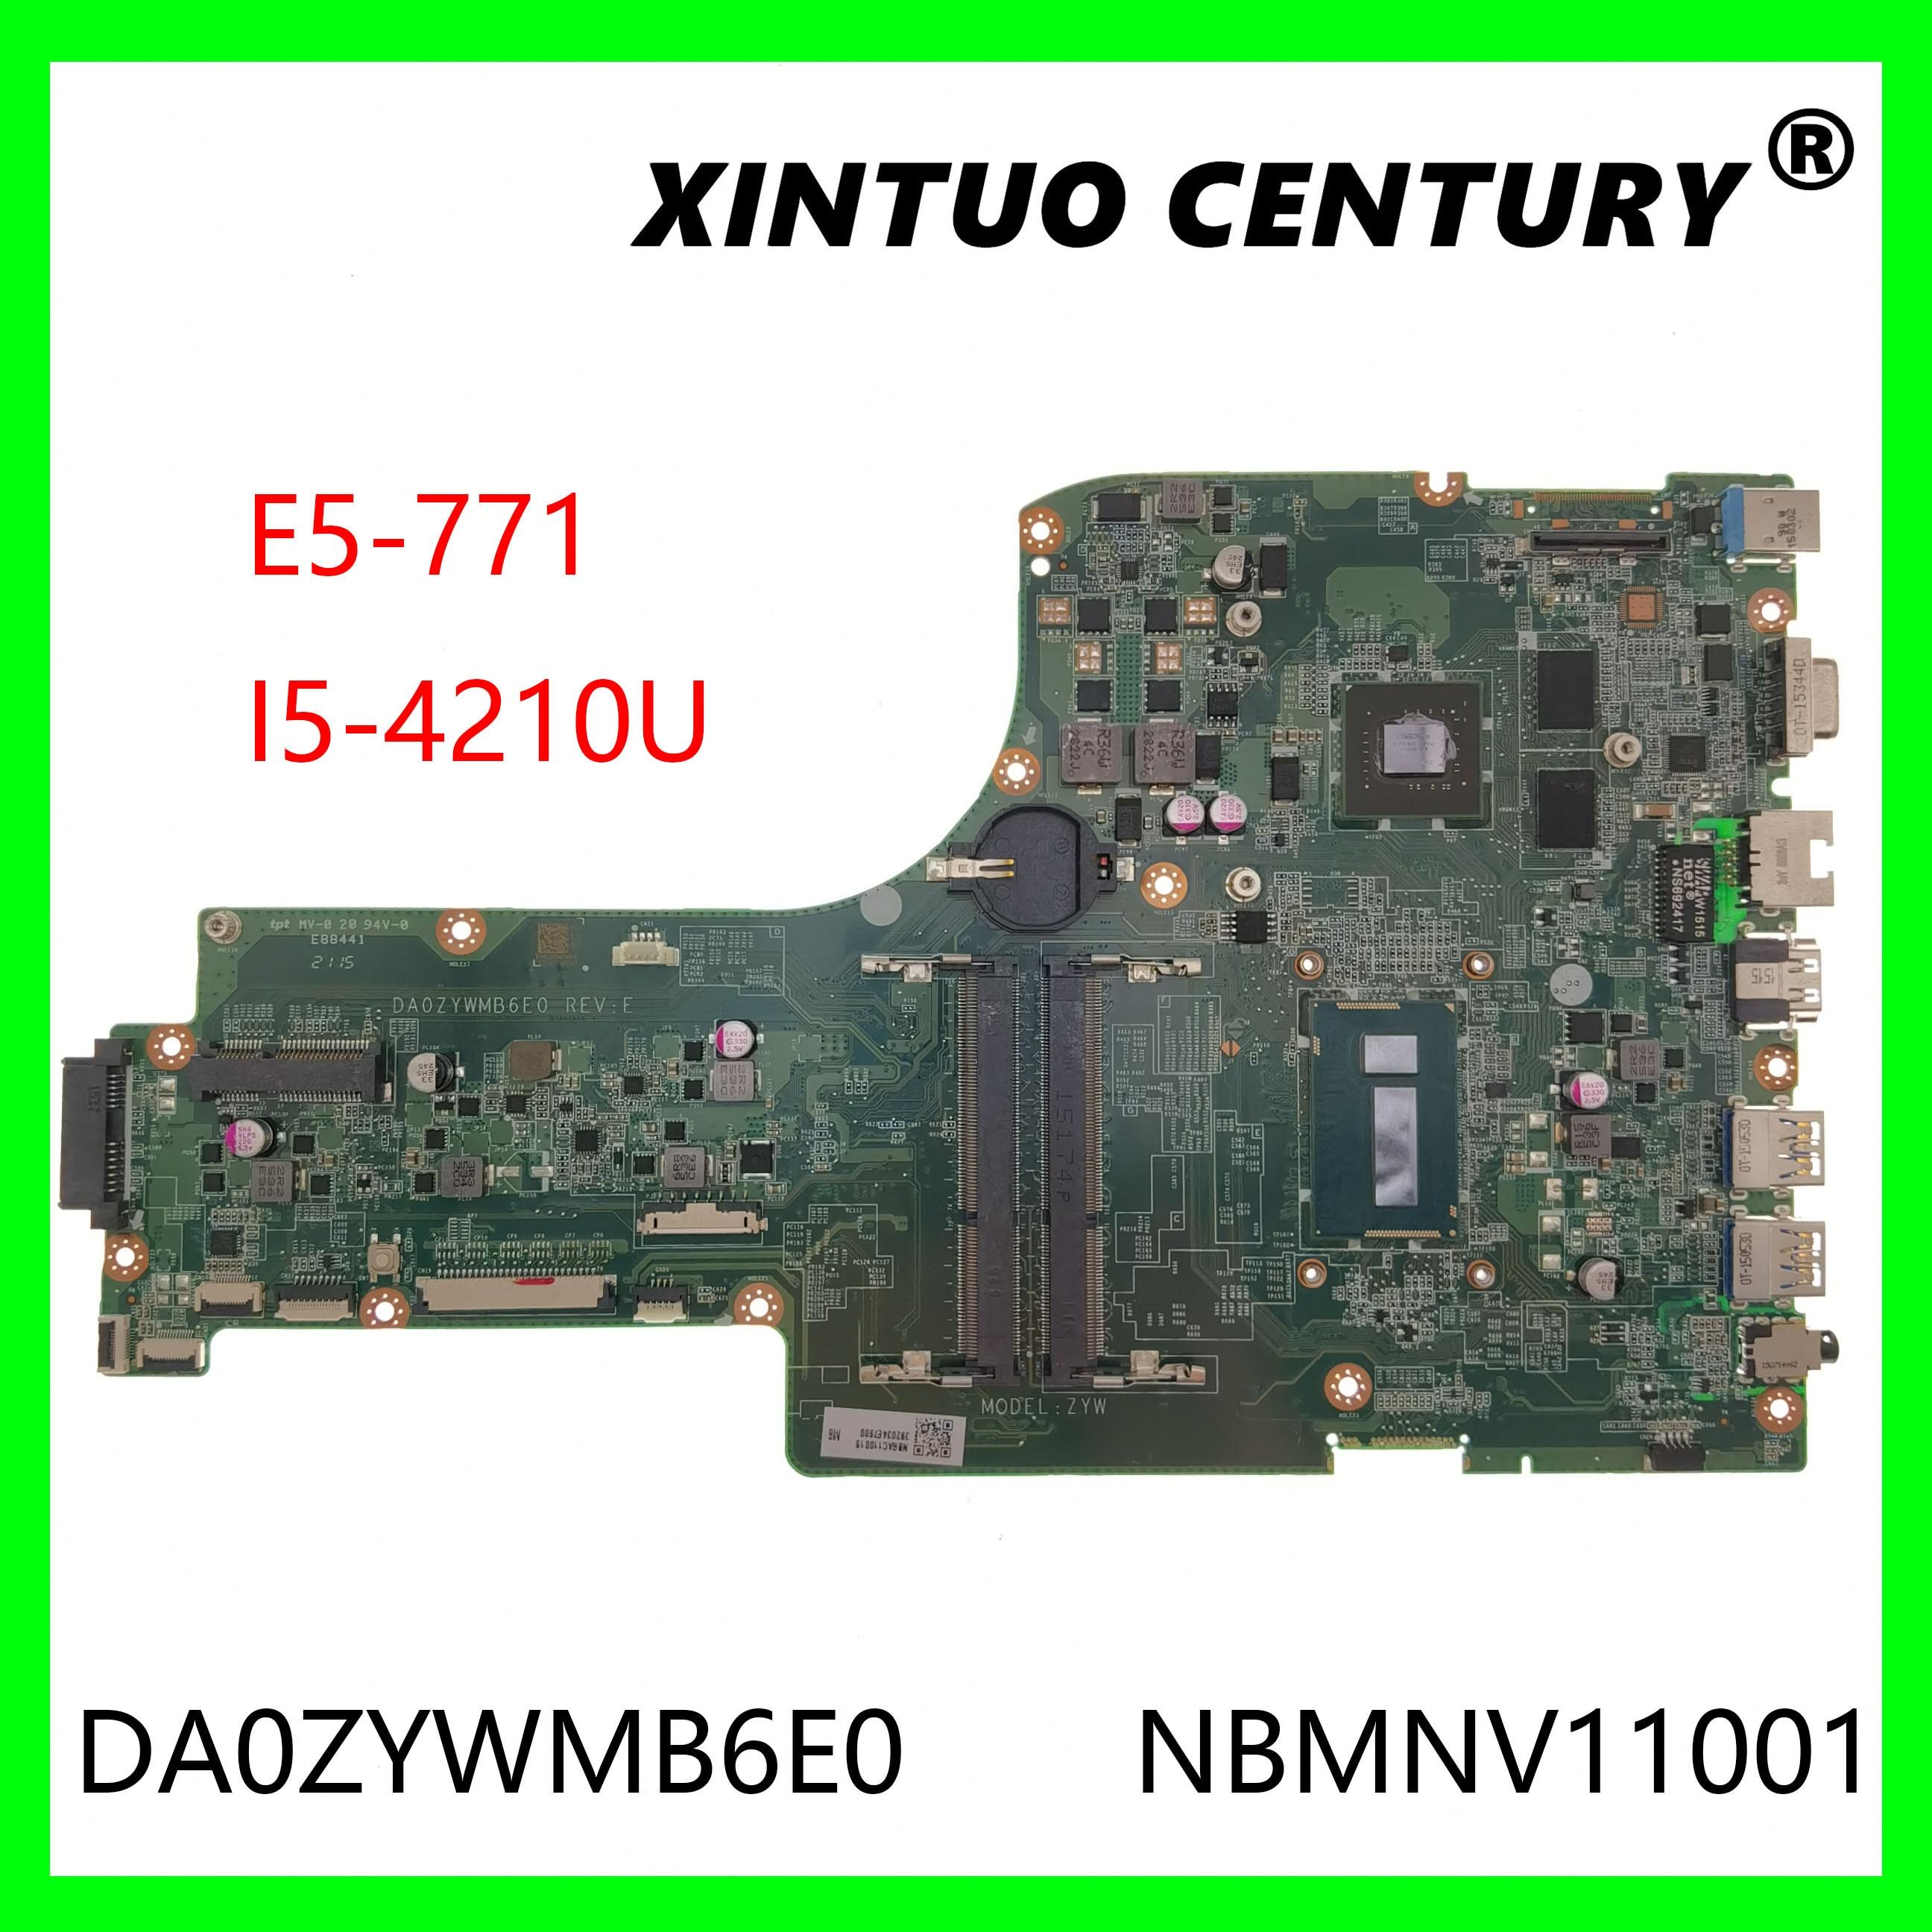 DA0ZYWMB6E0 NBMNX11001 NB.MNX11.005 لشركة أيسر أسباير E5-771G E5-771 اللوحة الأم للكمبيوتر المحمول SR1EF I5-4210U وحدة المعالجة المركزية